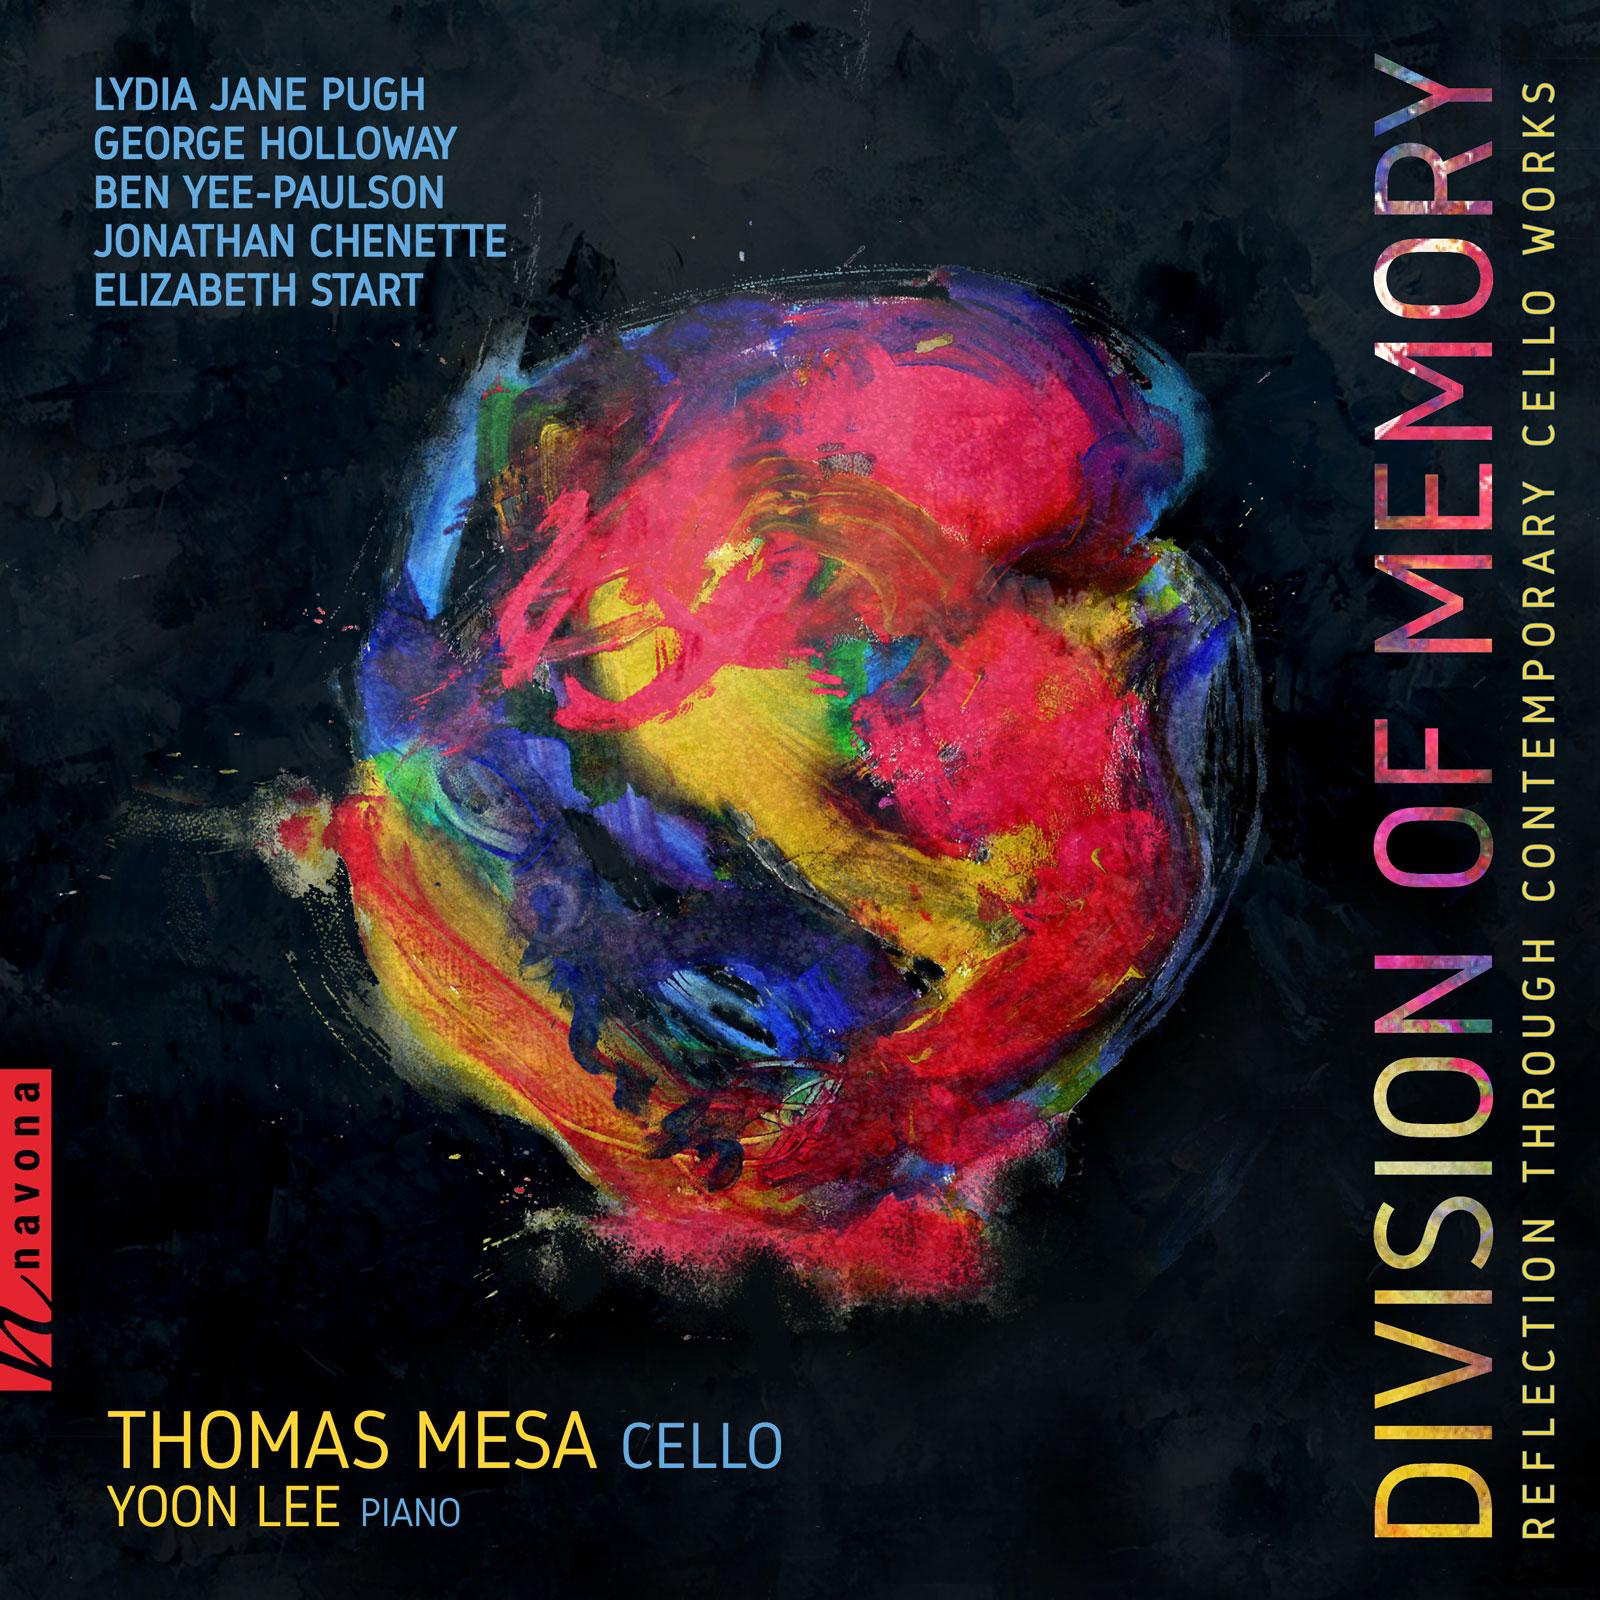 Division of Memory - Album Cover